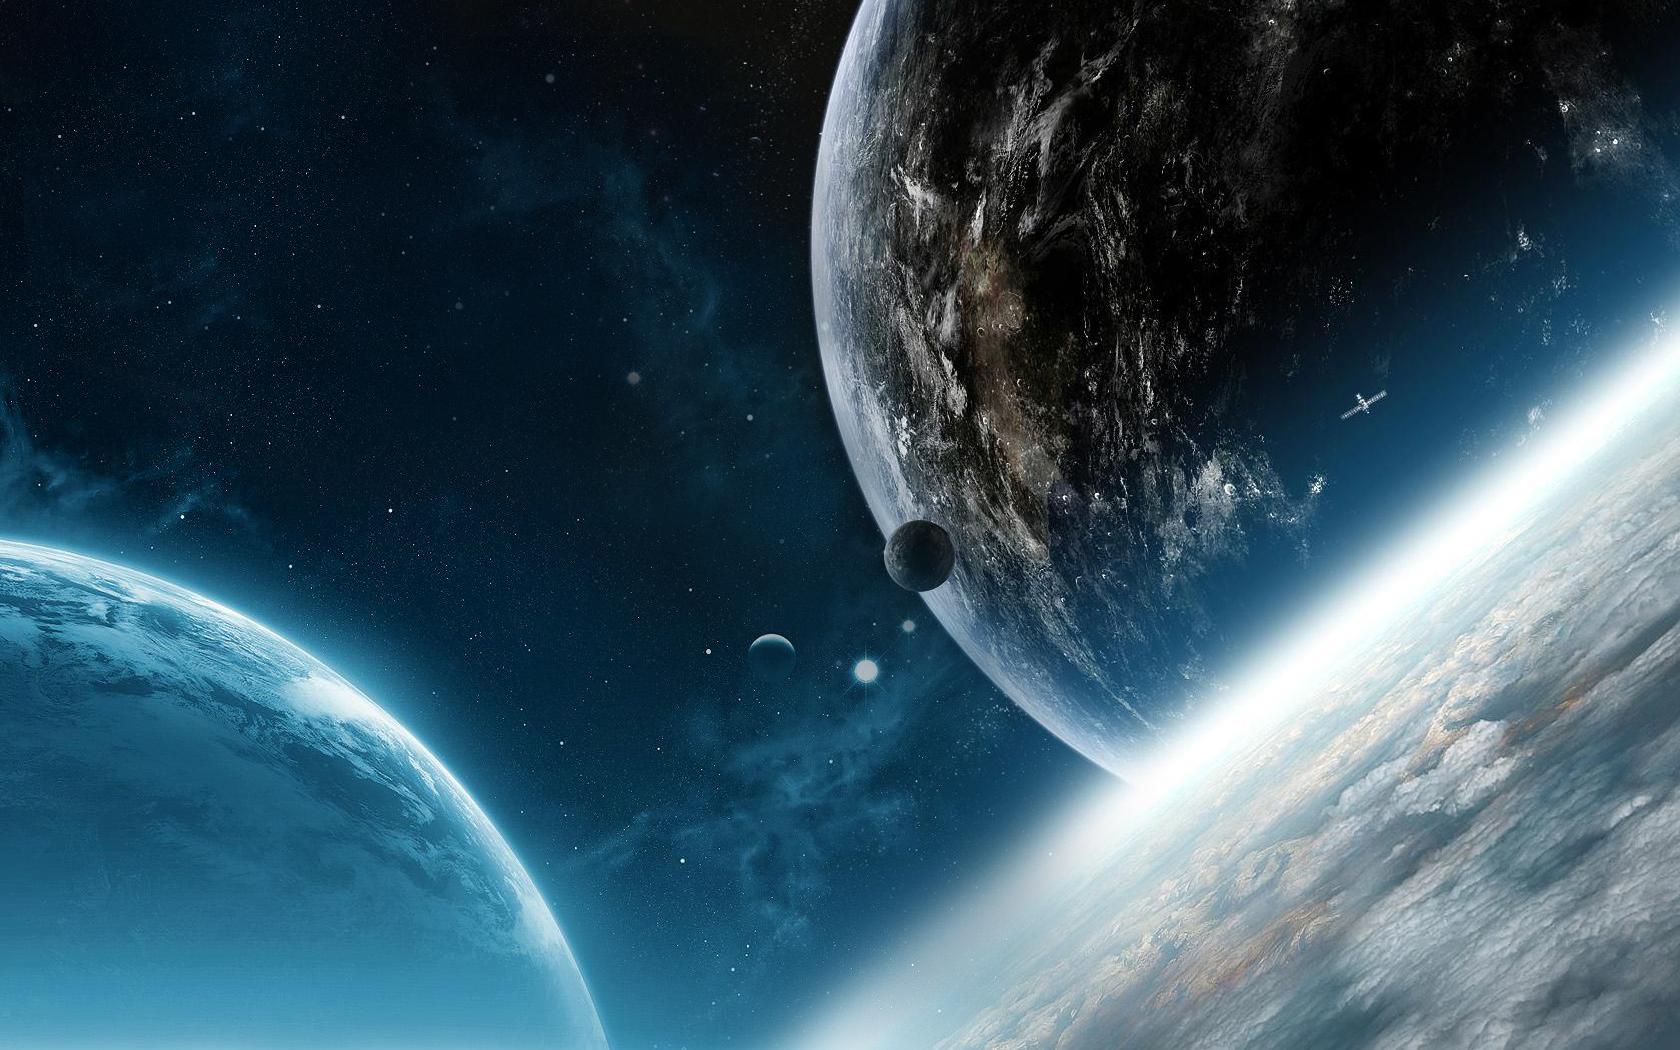 Space-Planets-Sci-Fi-Wallpaper